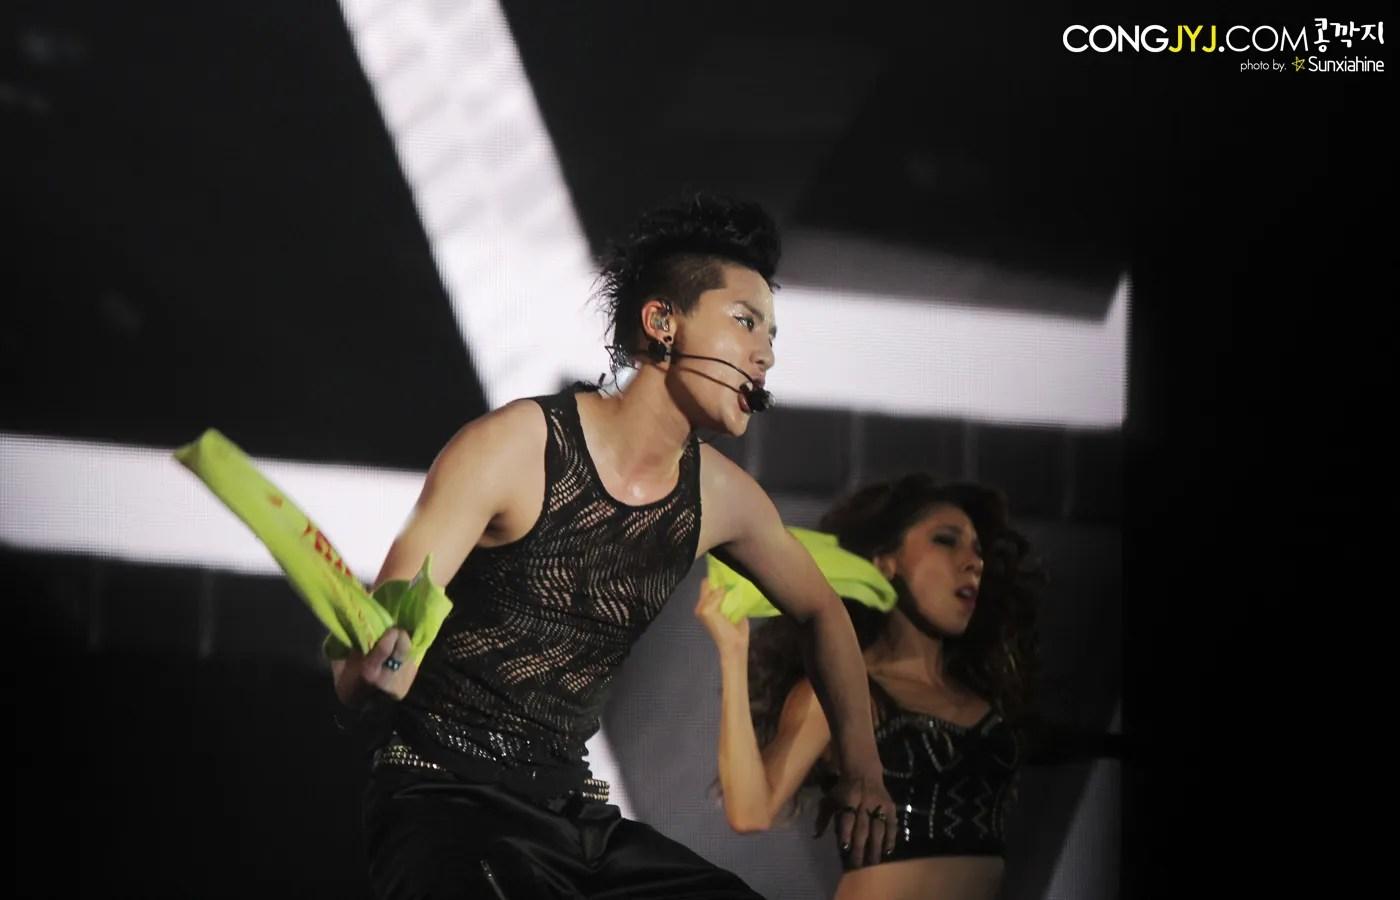 photo seould1_congjyj13.jpg